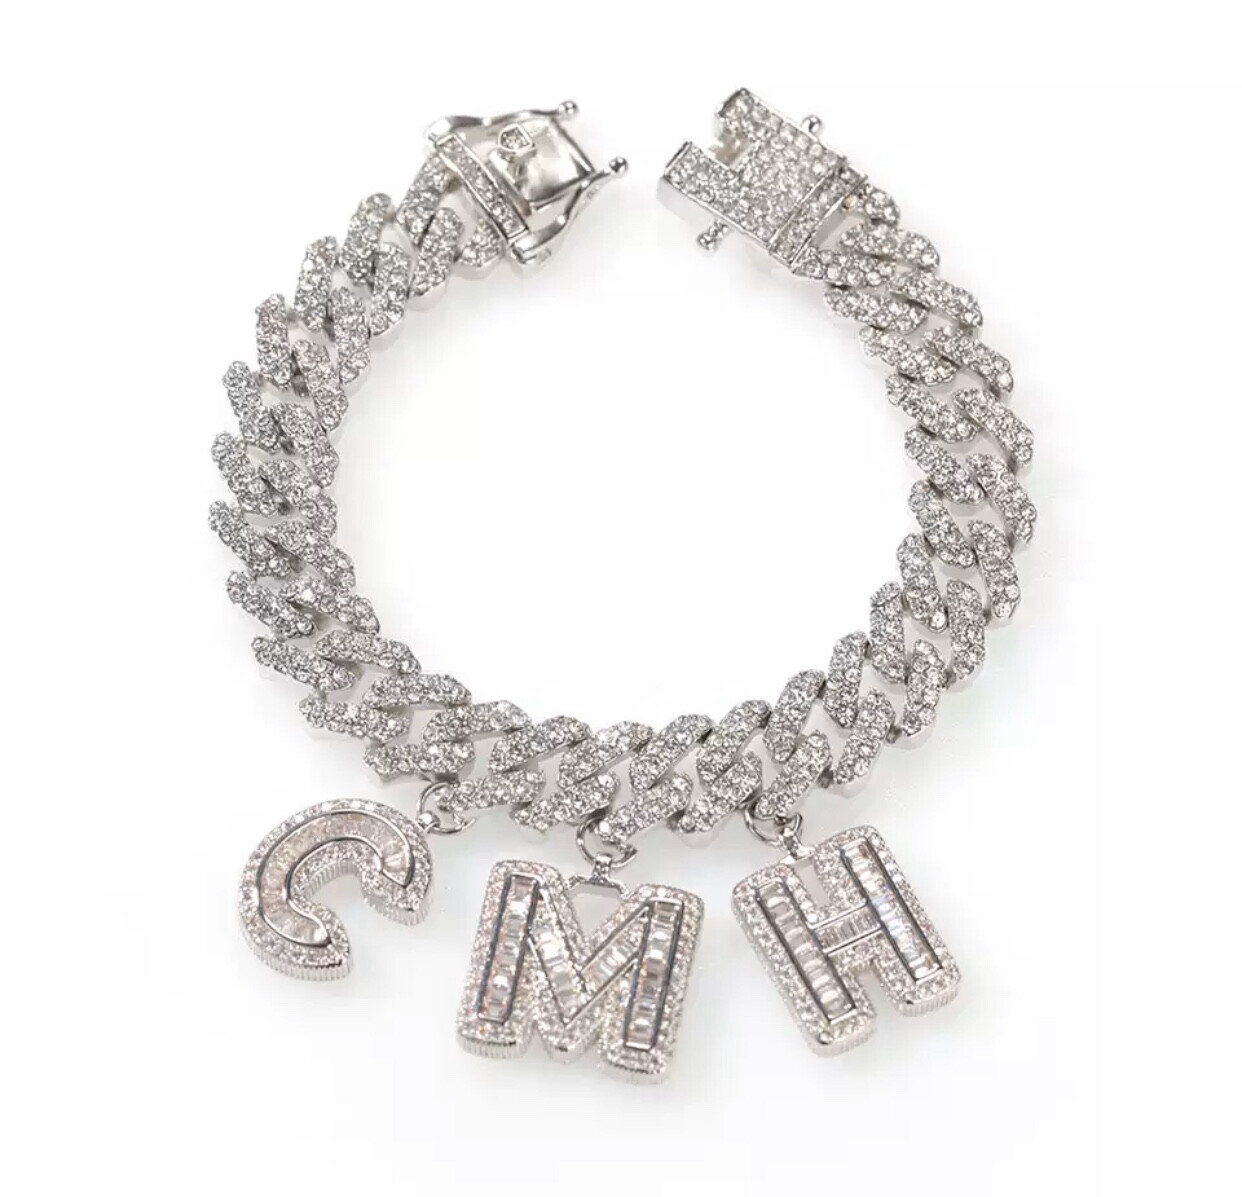 Cuban Link Name Bracelet